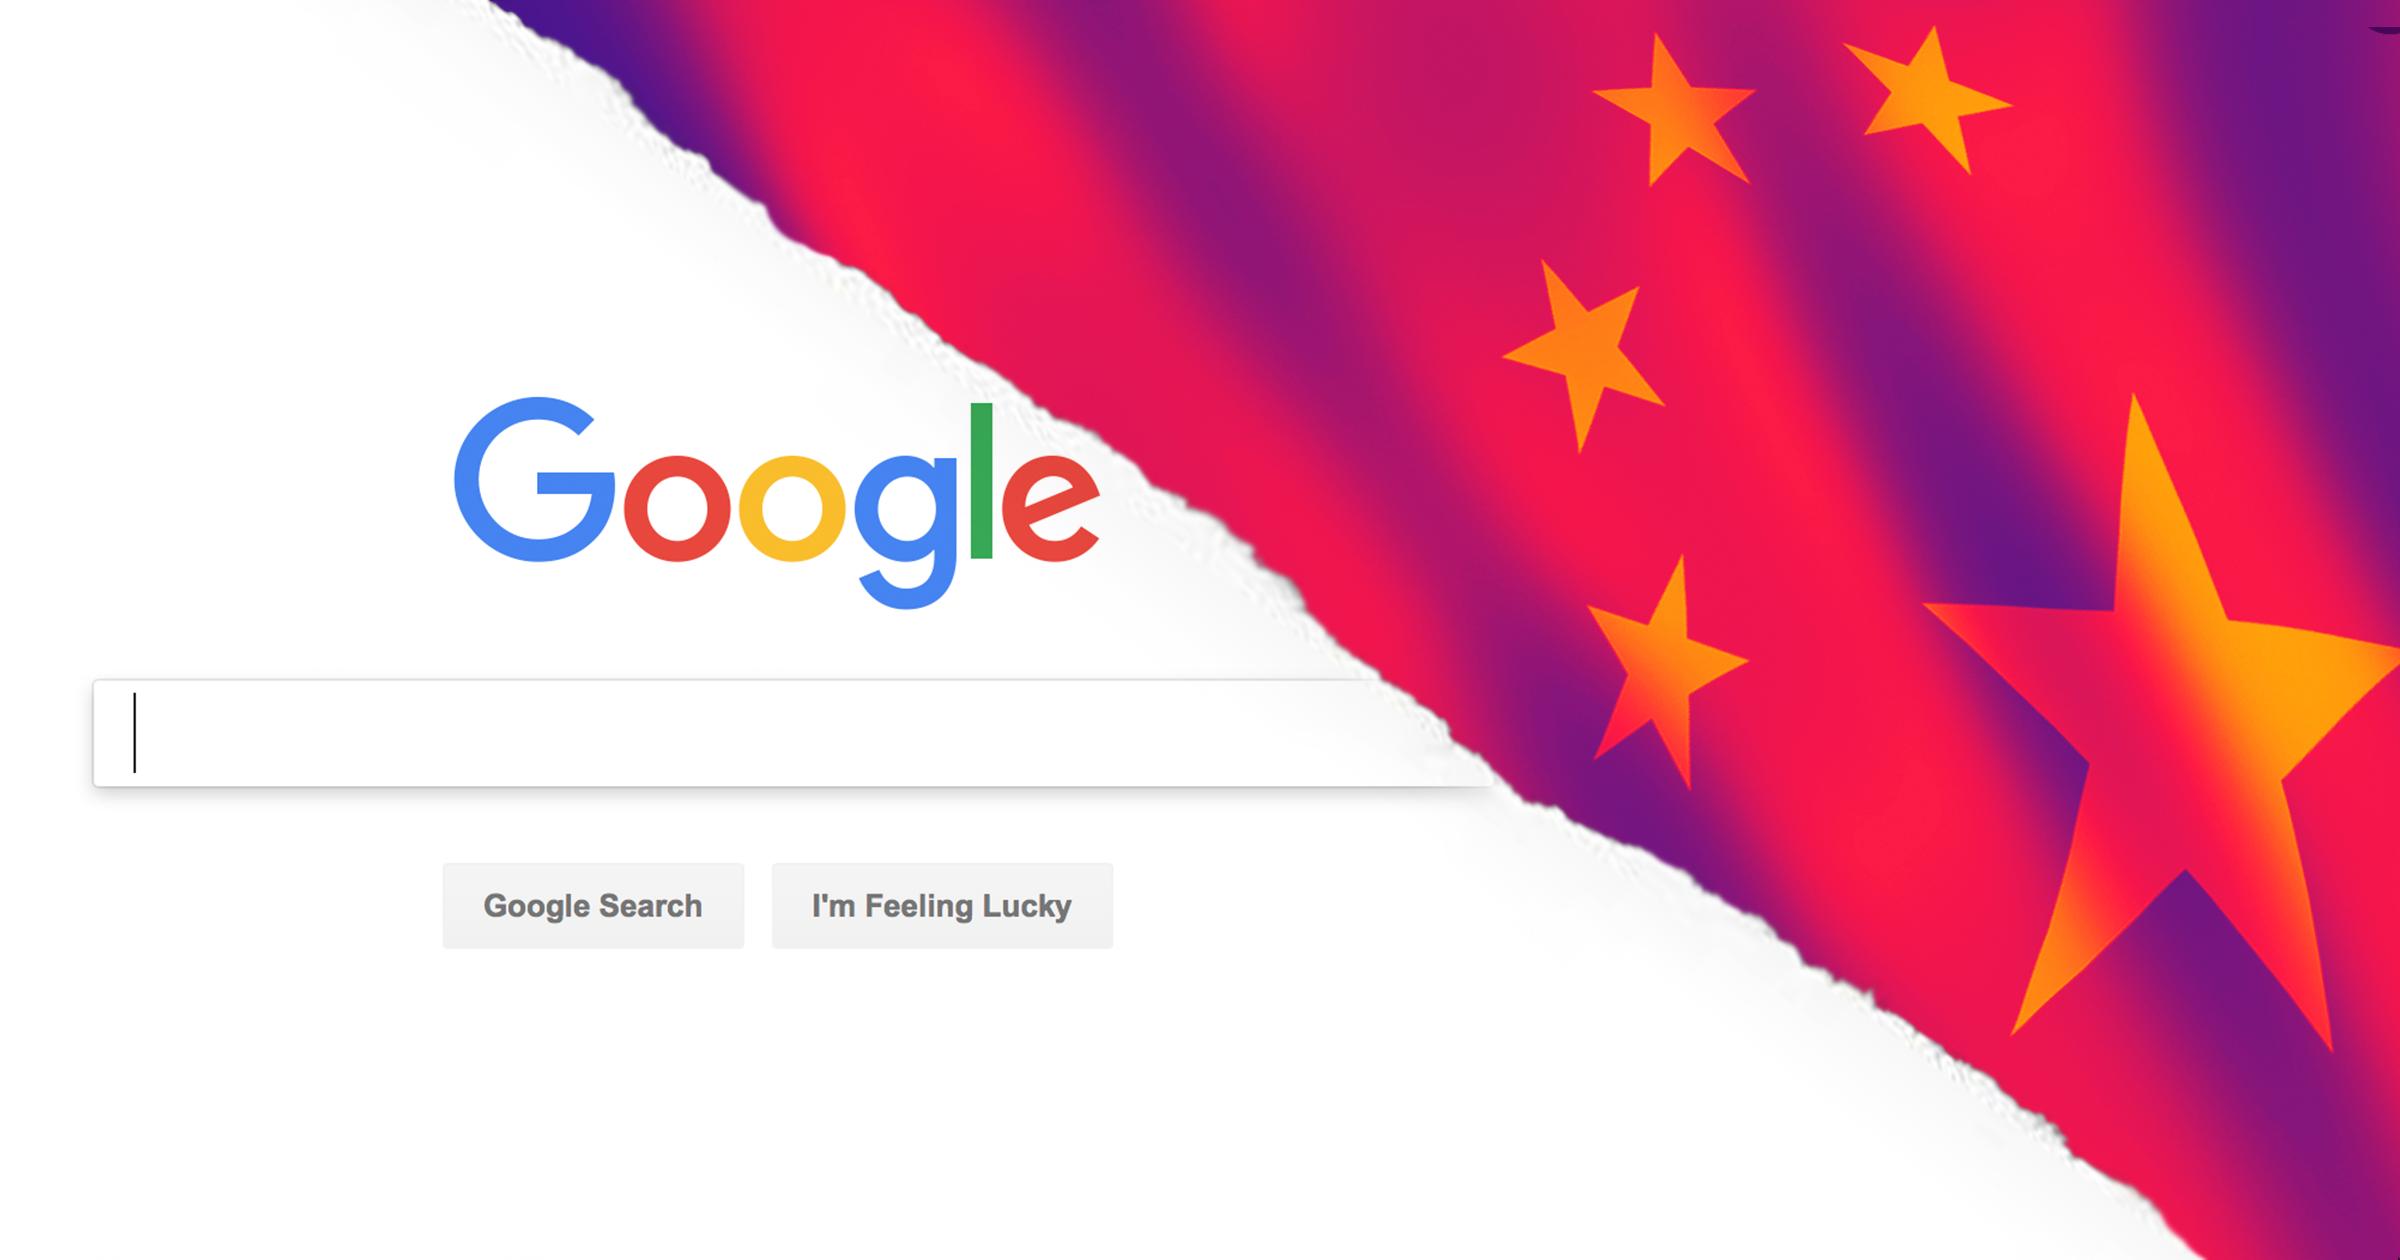 اینترنت دو پاره: چالش ظهور اینترنت چینی